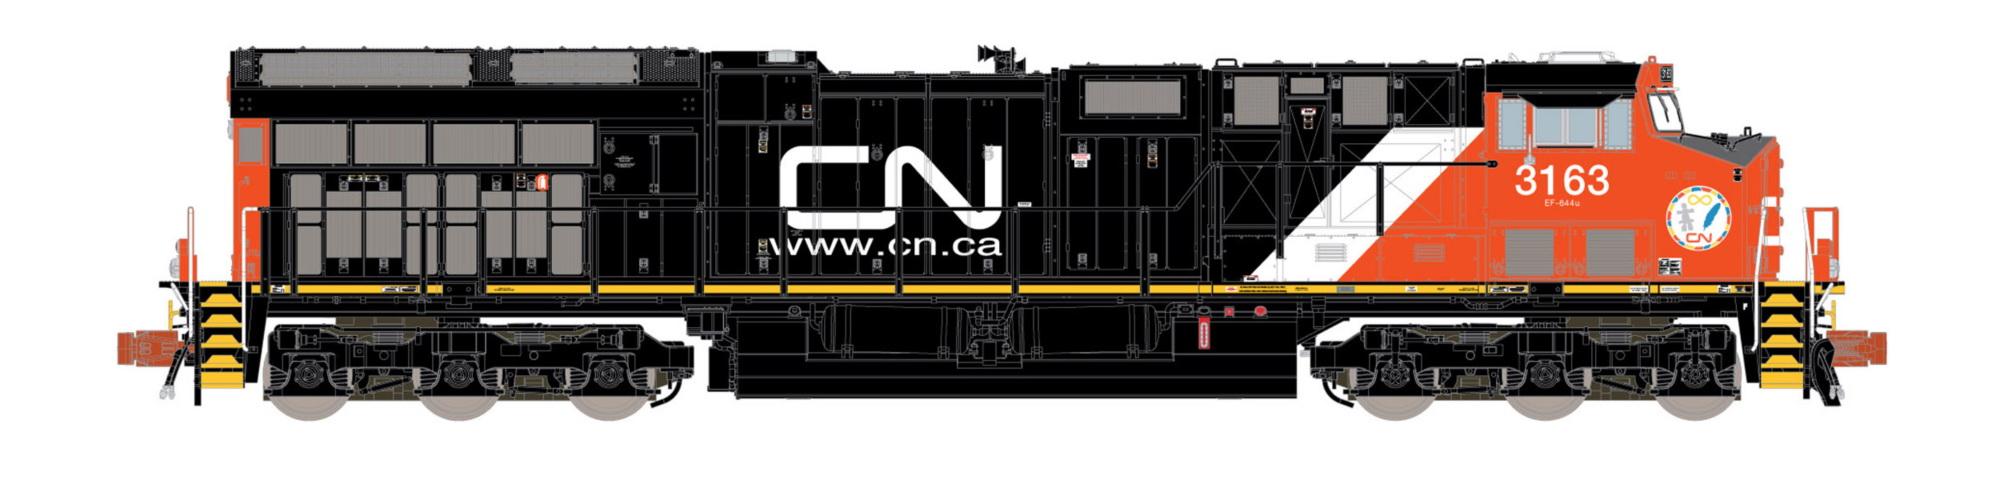 N Scale - ScaleTrains.com - SXT32028 - Locomotive, Diesel, GE GEVO - Canadian National - 3174